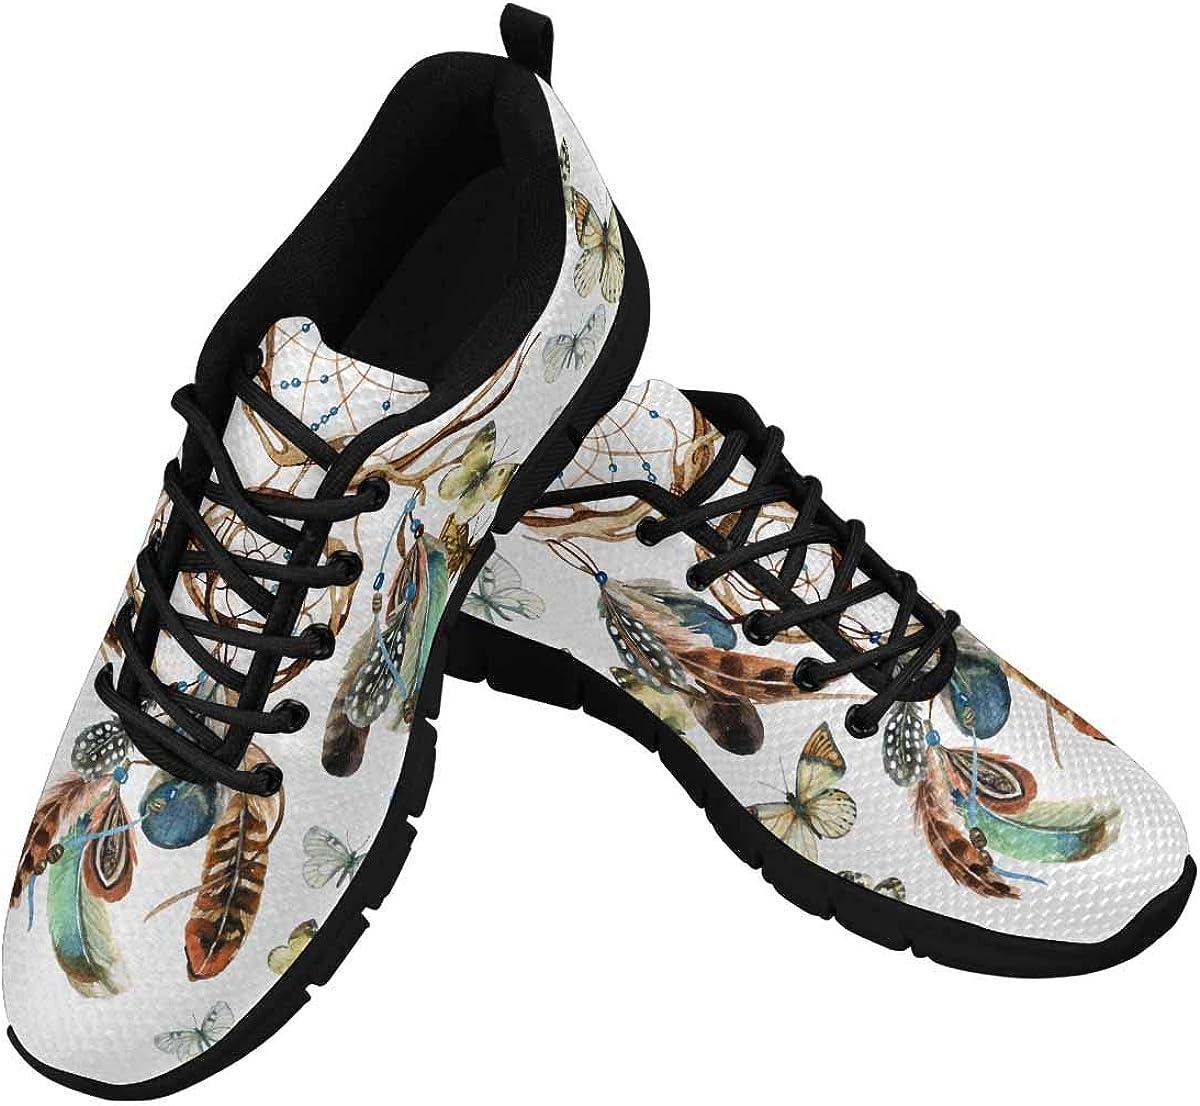 INTERESTPRINT Dreamcatcher and Butterflies Women's Athletic Walking Shoes Breathe Comfort Mesh